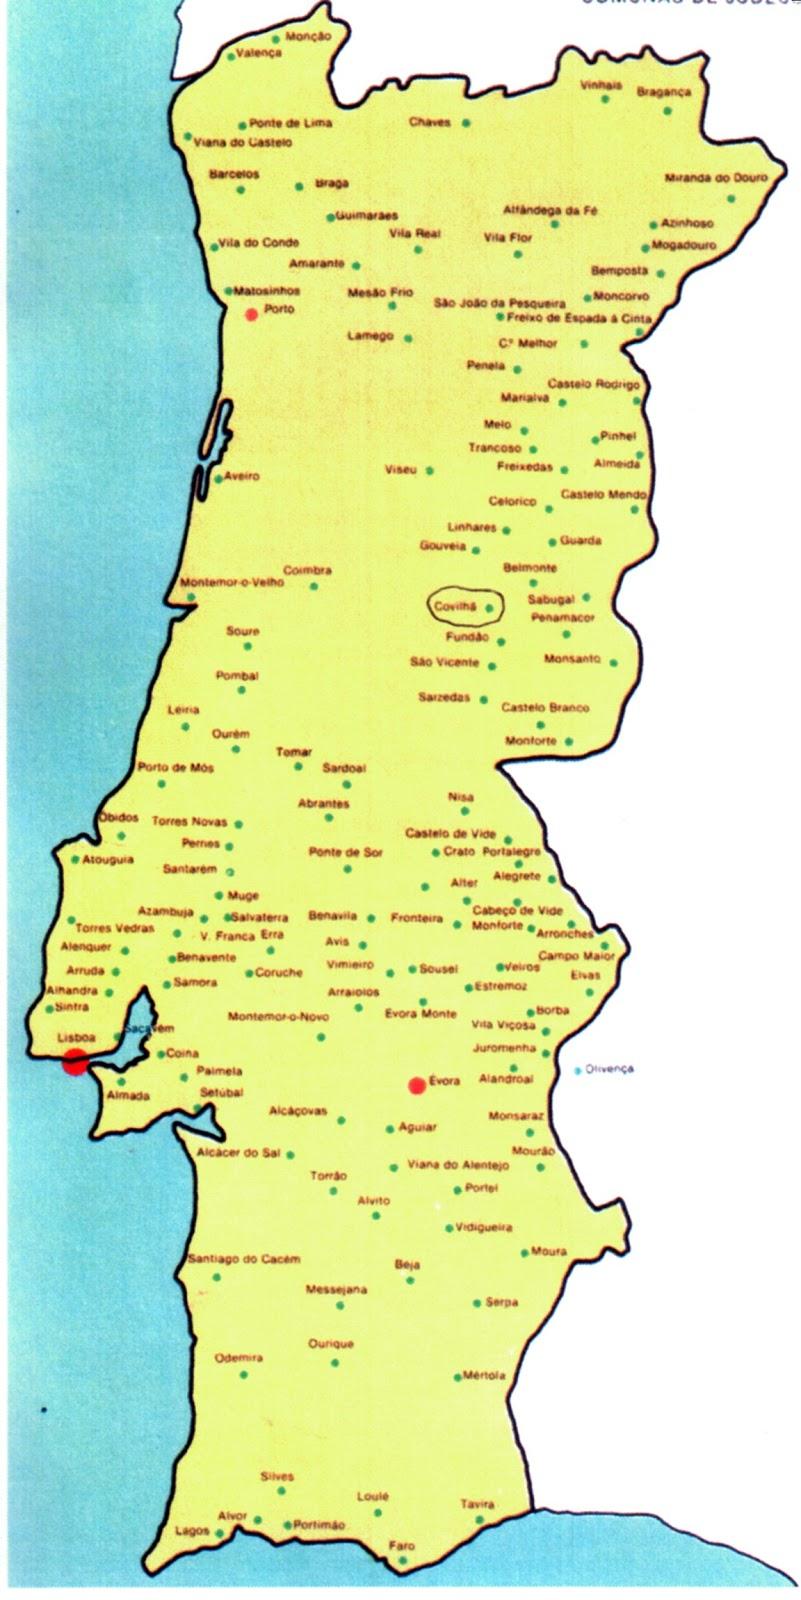 covilhã mapa Covilhã   Subsídios para a sua História: Covilhã   Sobre o  covilhã mapa